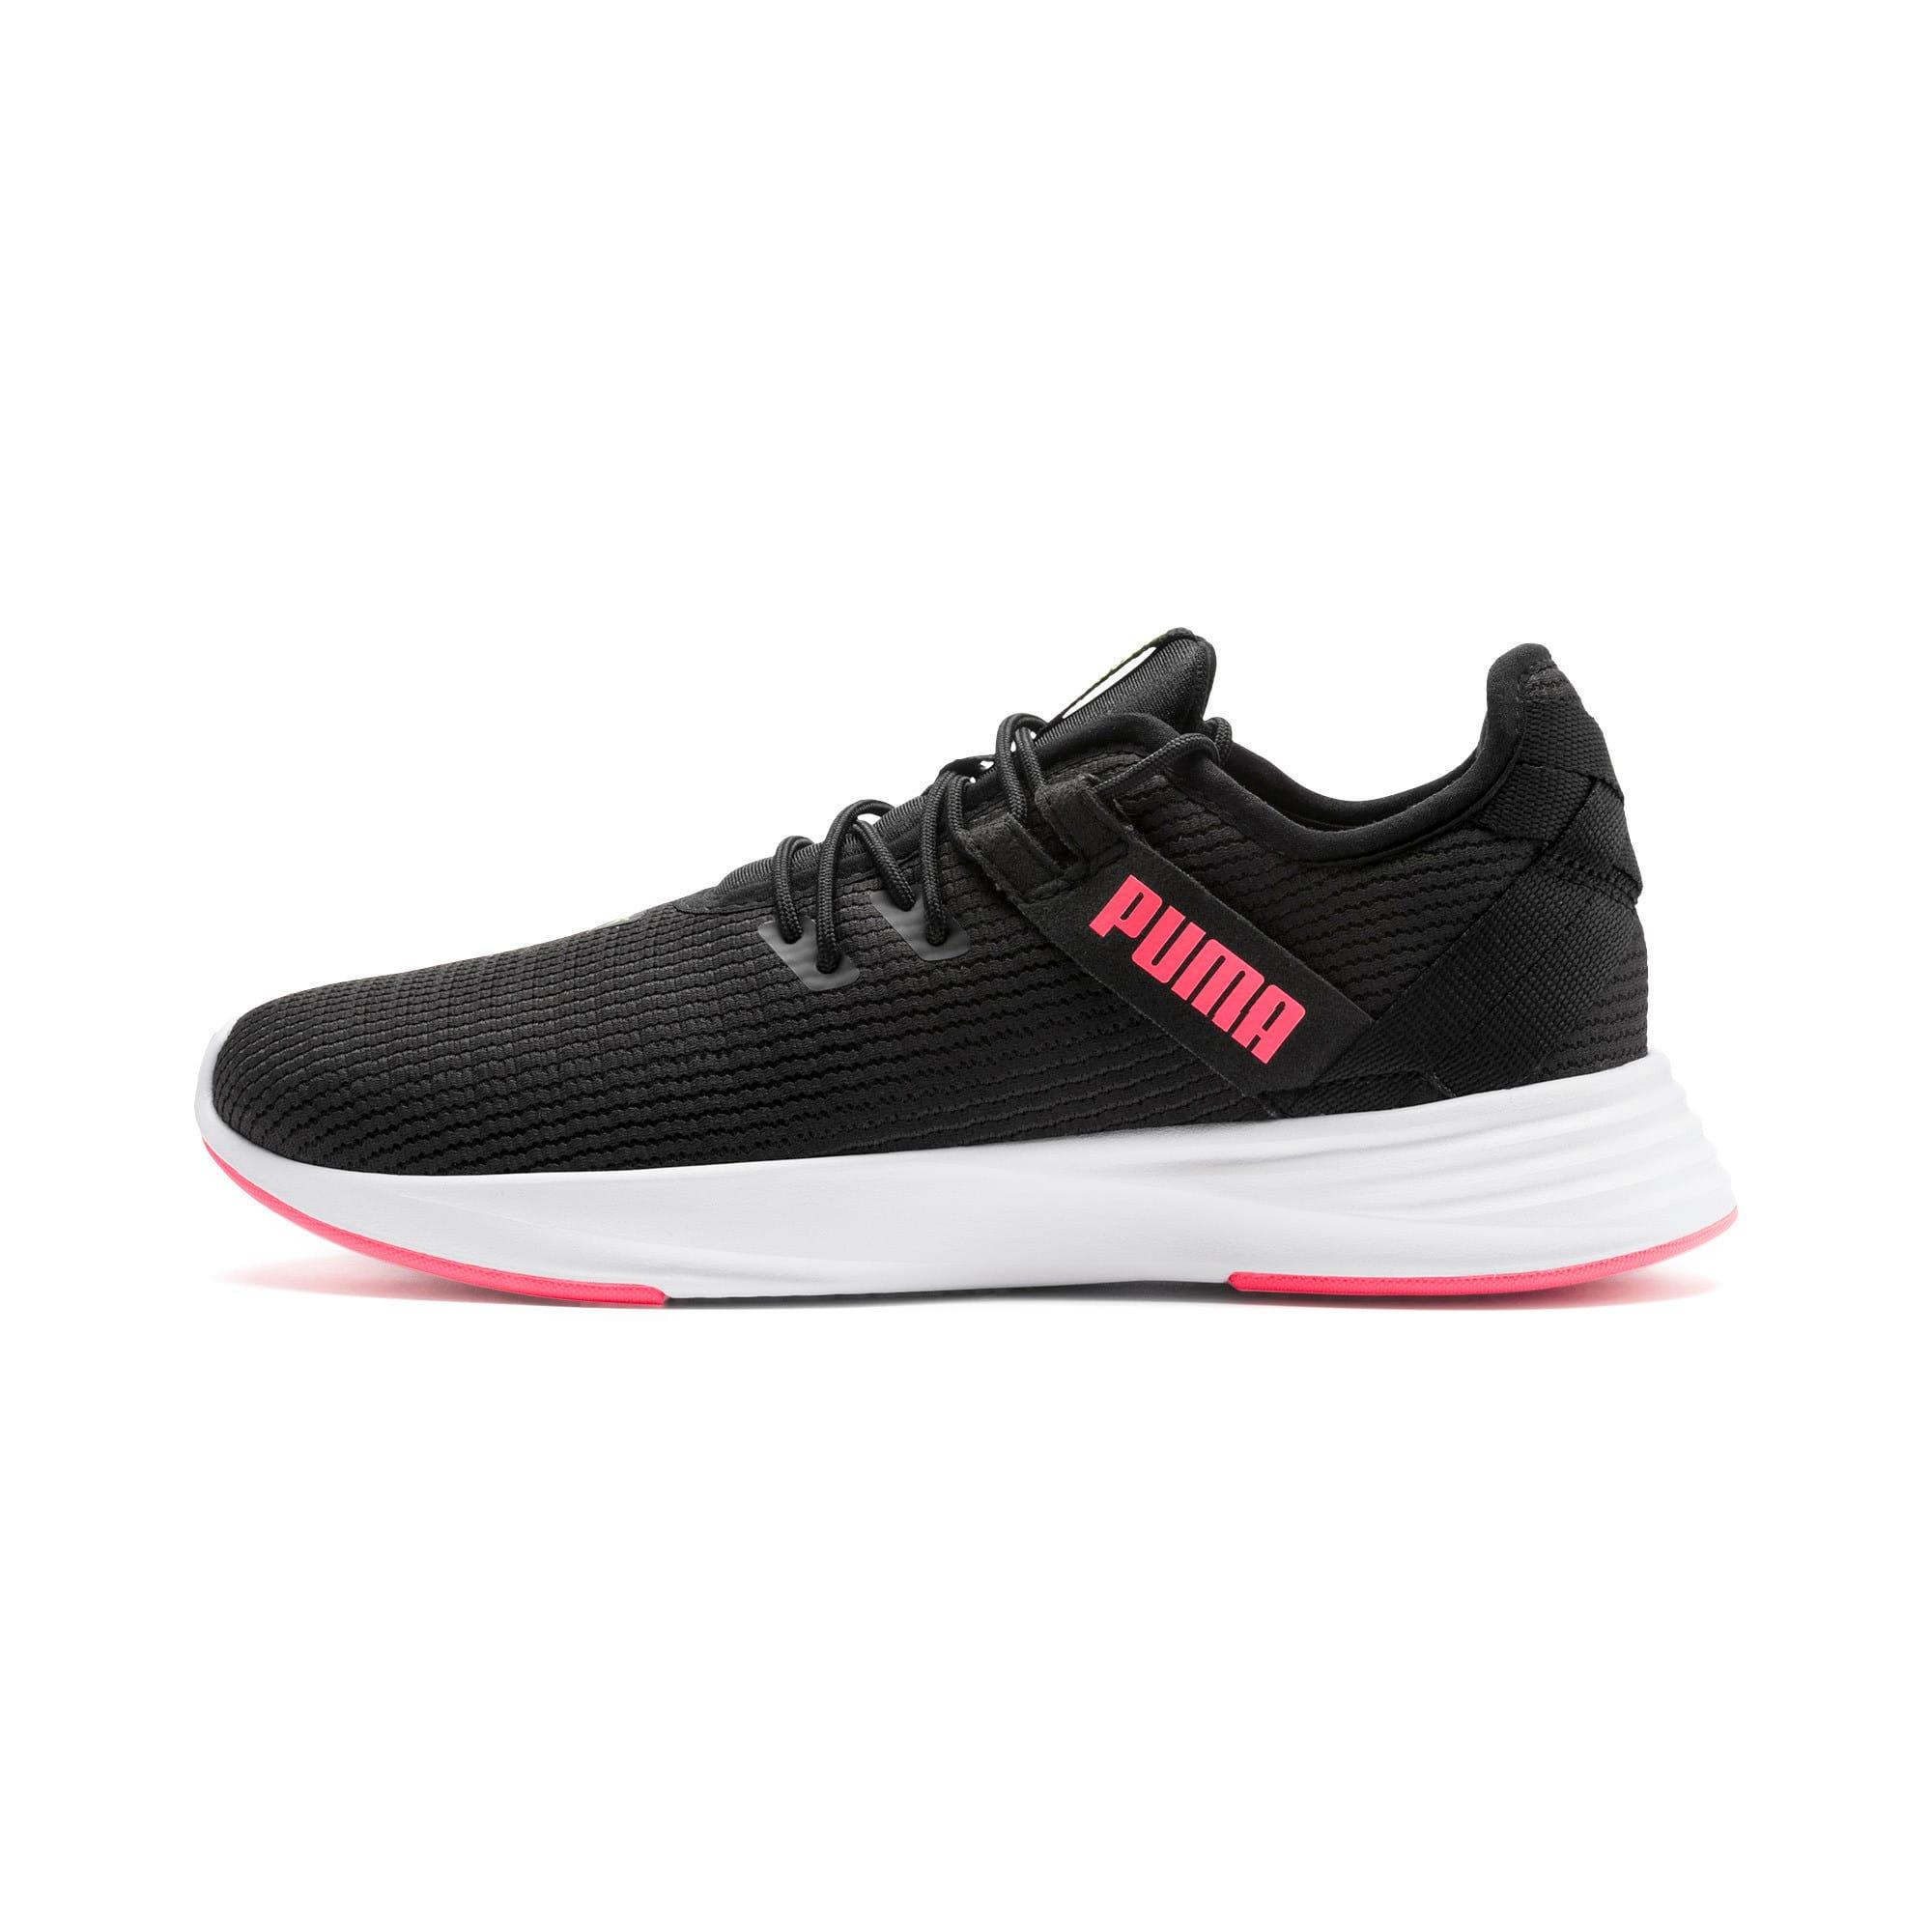 Thumbnail 1 of Radiate XT Women's Training Sneakers, Puma Black-Pink Alert, medium-IND